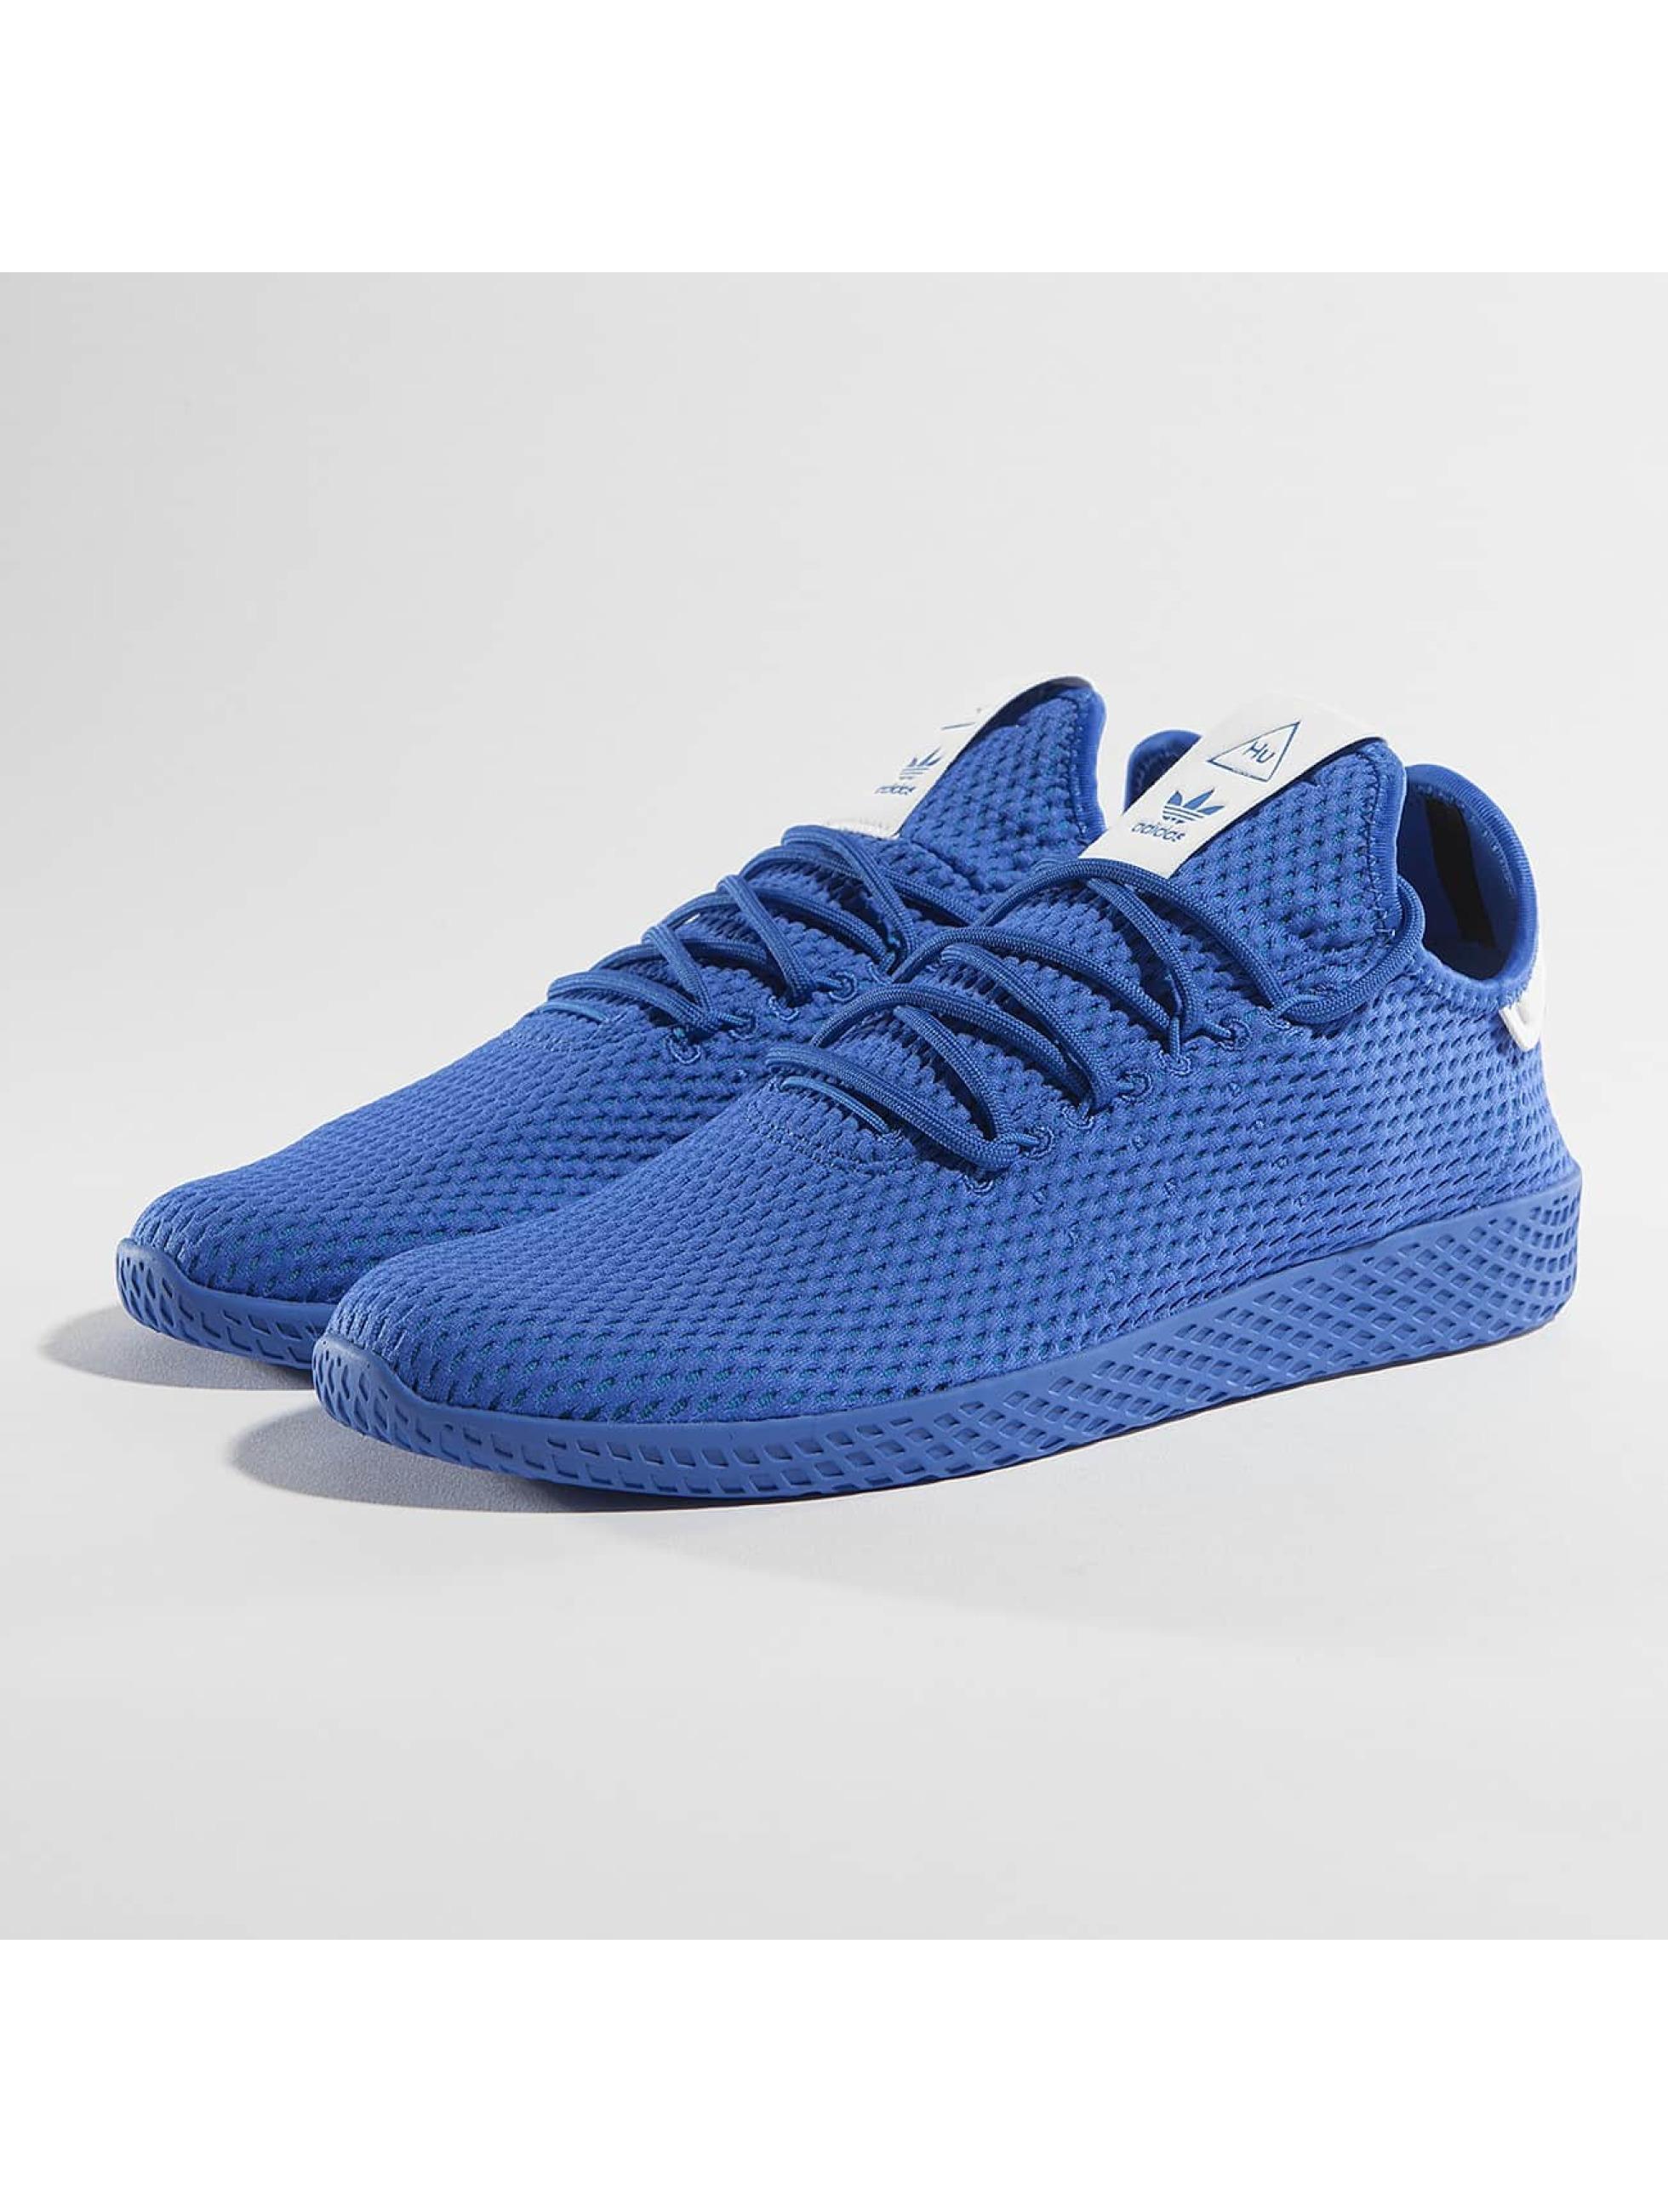 adidas Sneakers Pharrell Williams Tennis Hu blue